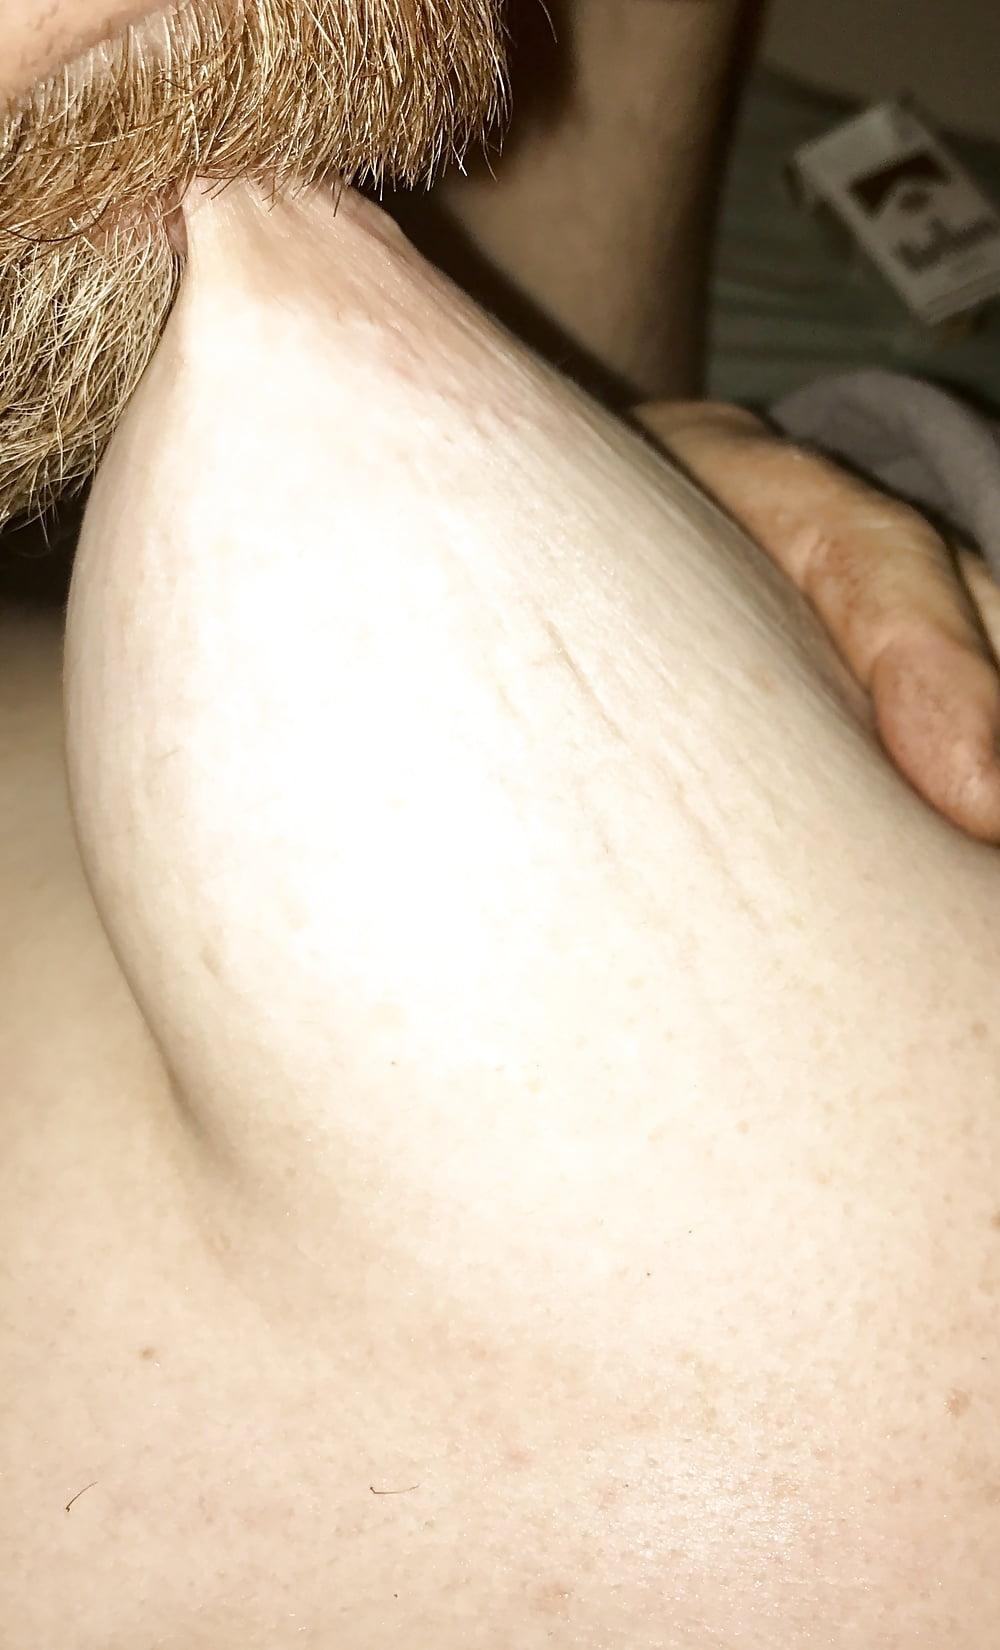 Sucking My Dick Riding Me